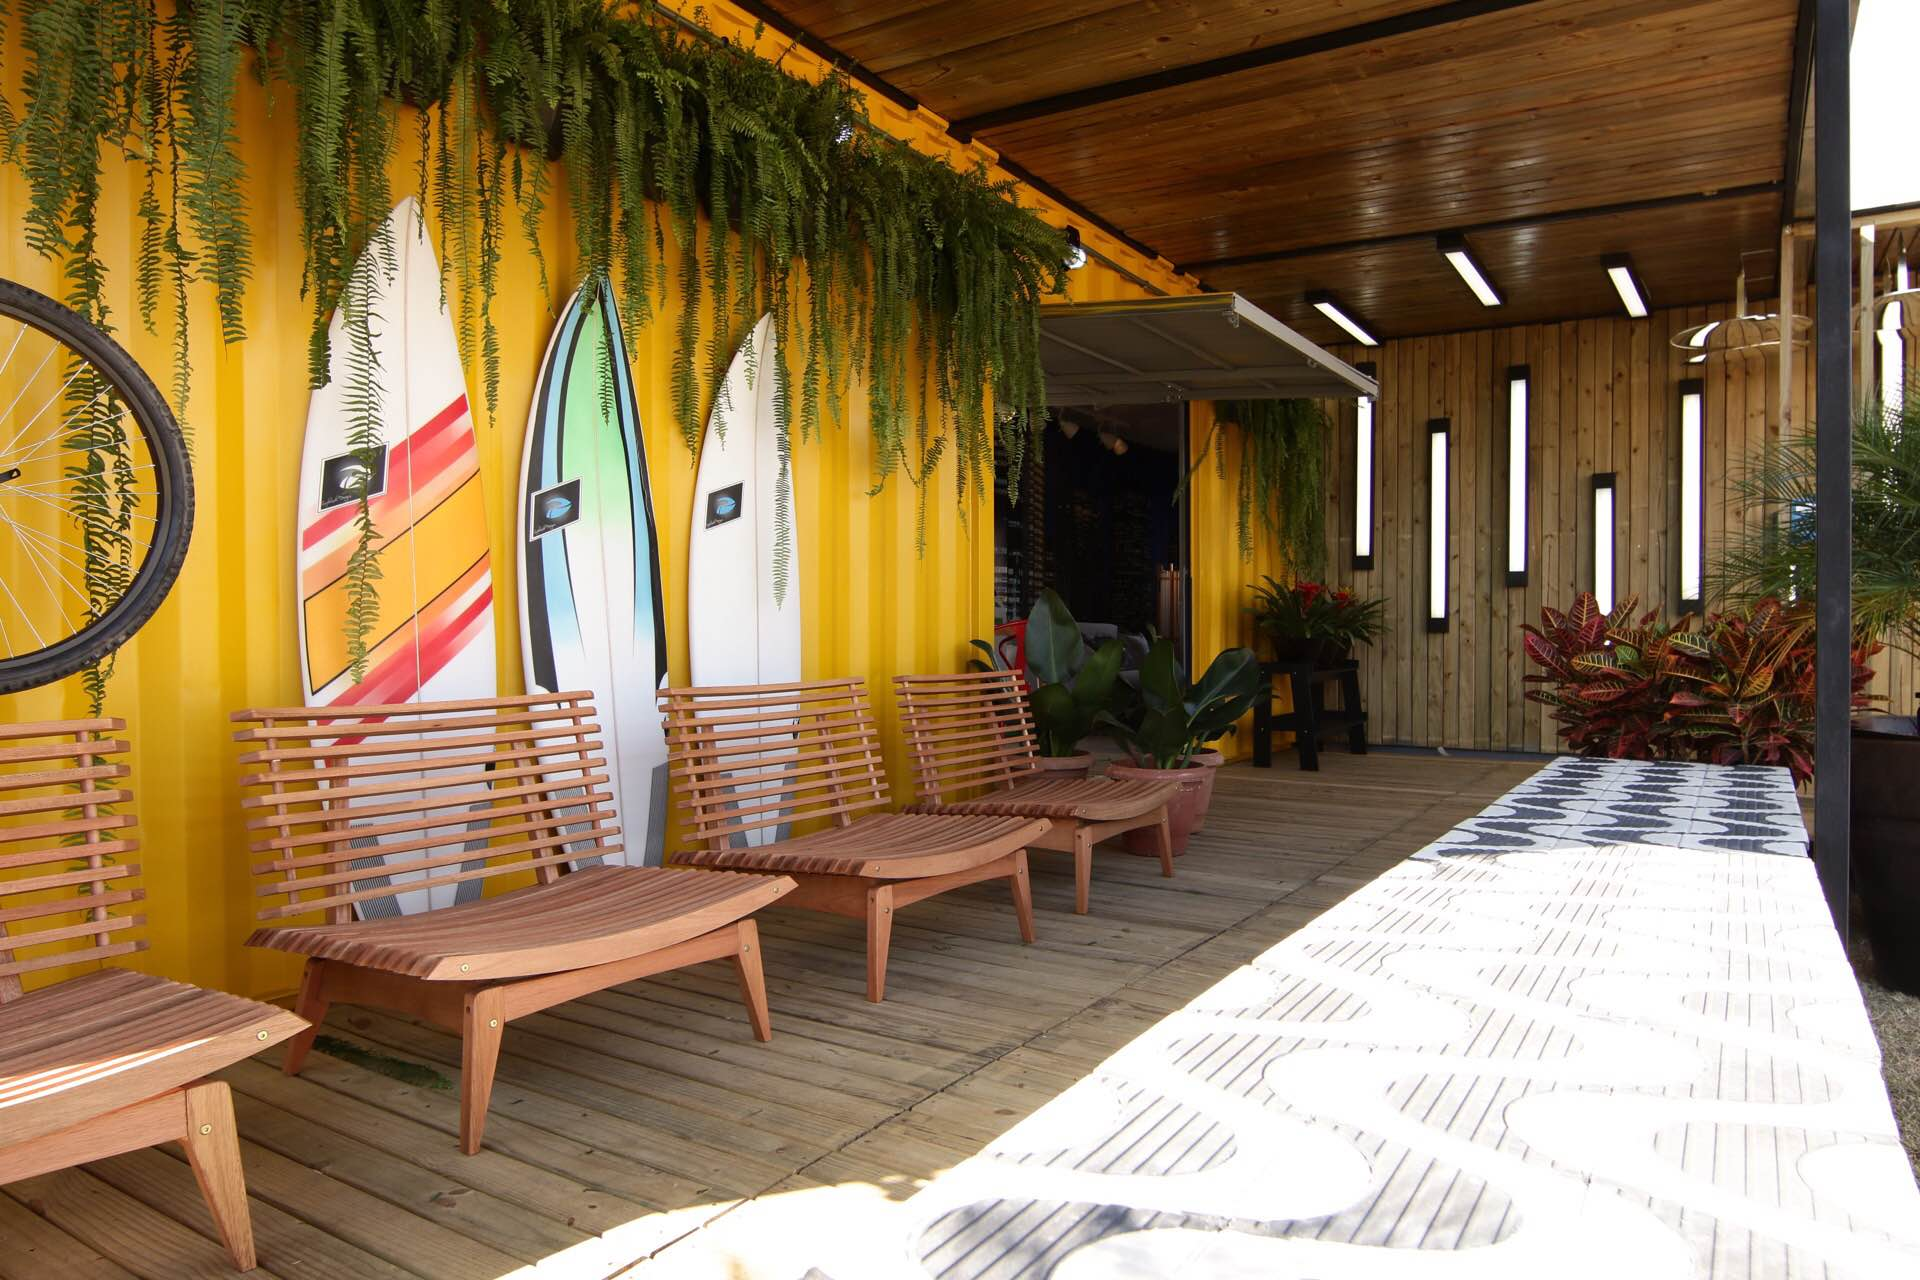 Casa Viva Leroy Merlin: varanda inspirada no Rio de Janeiro